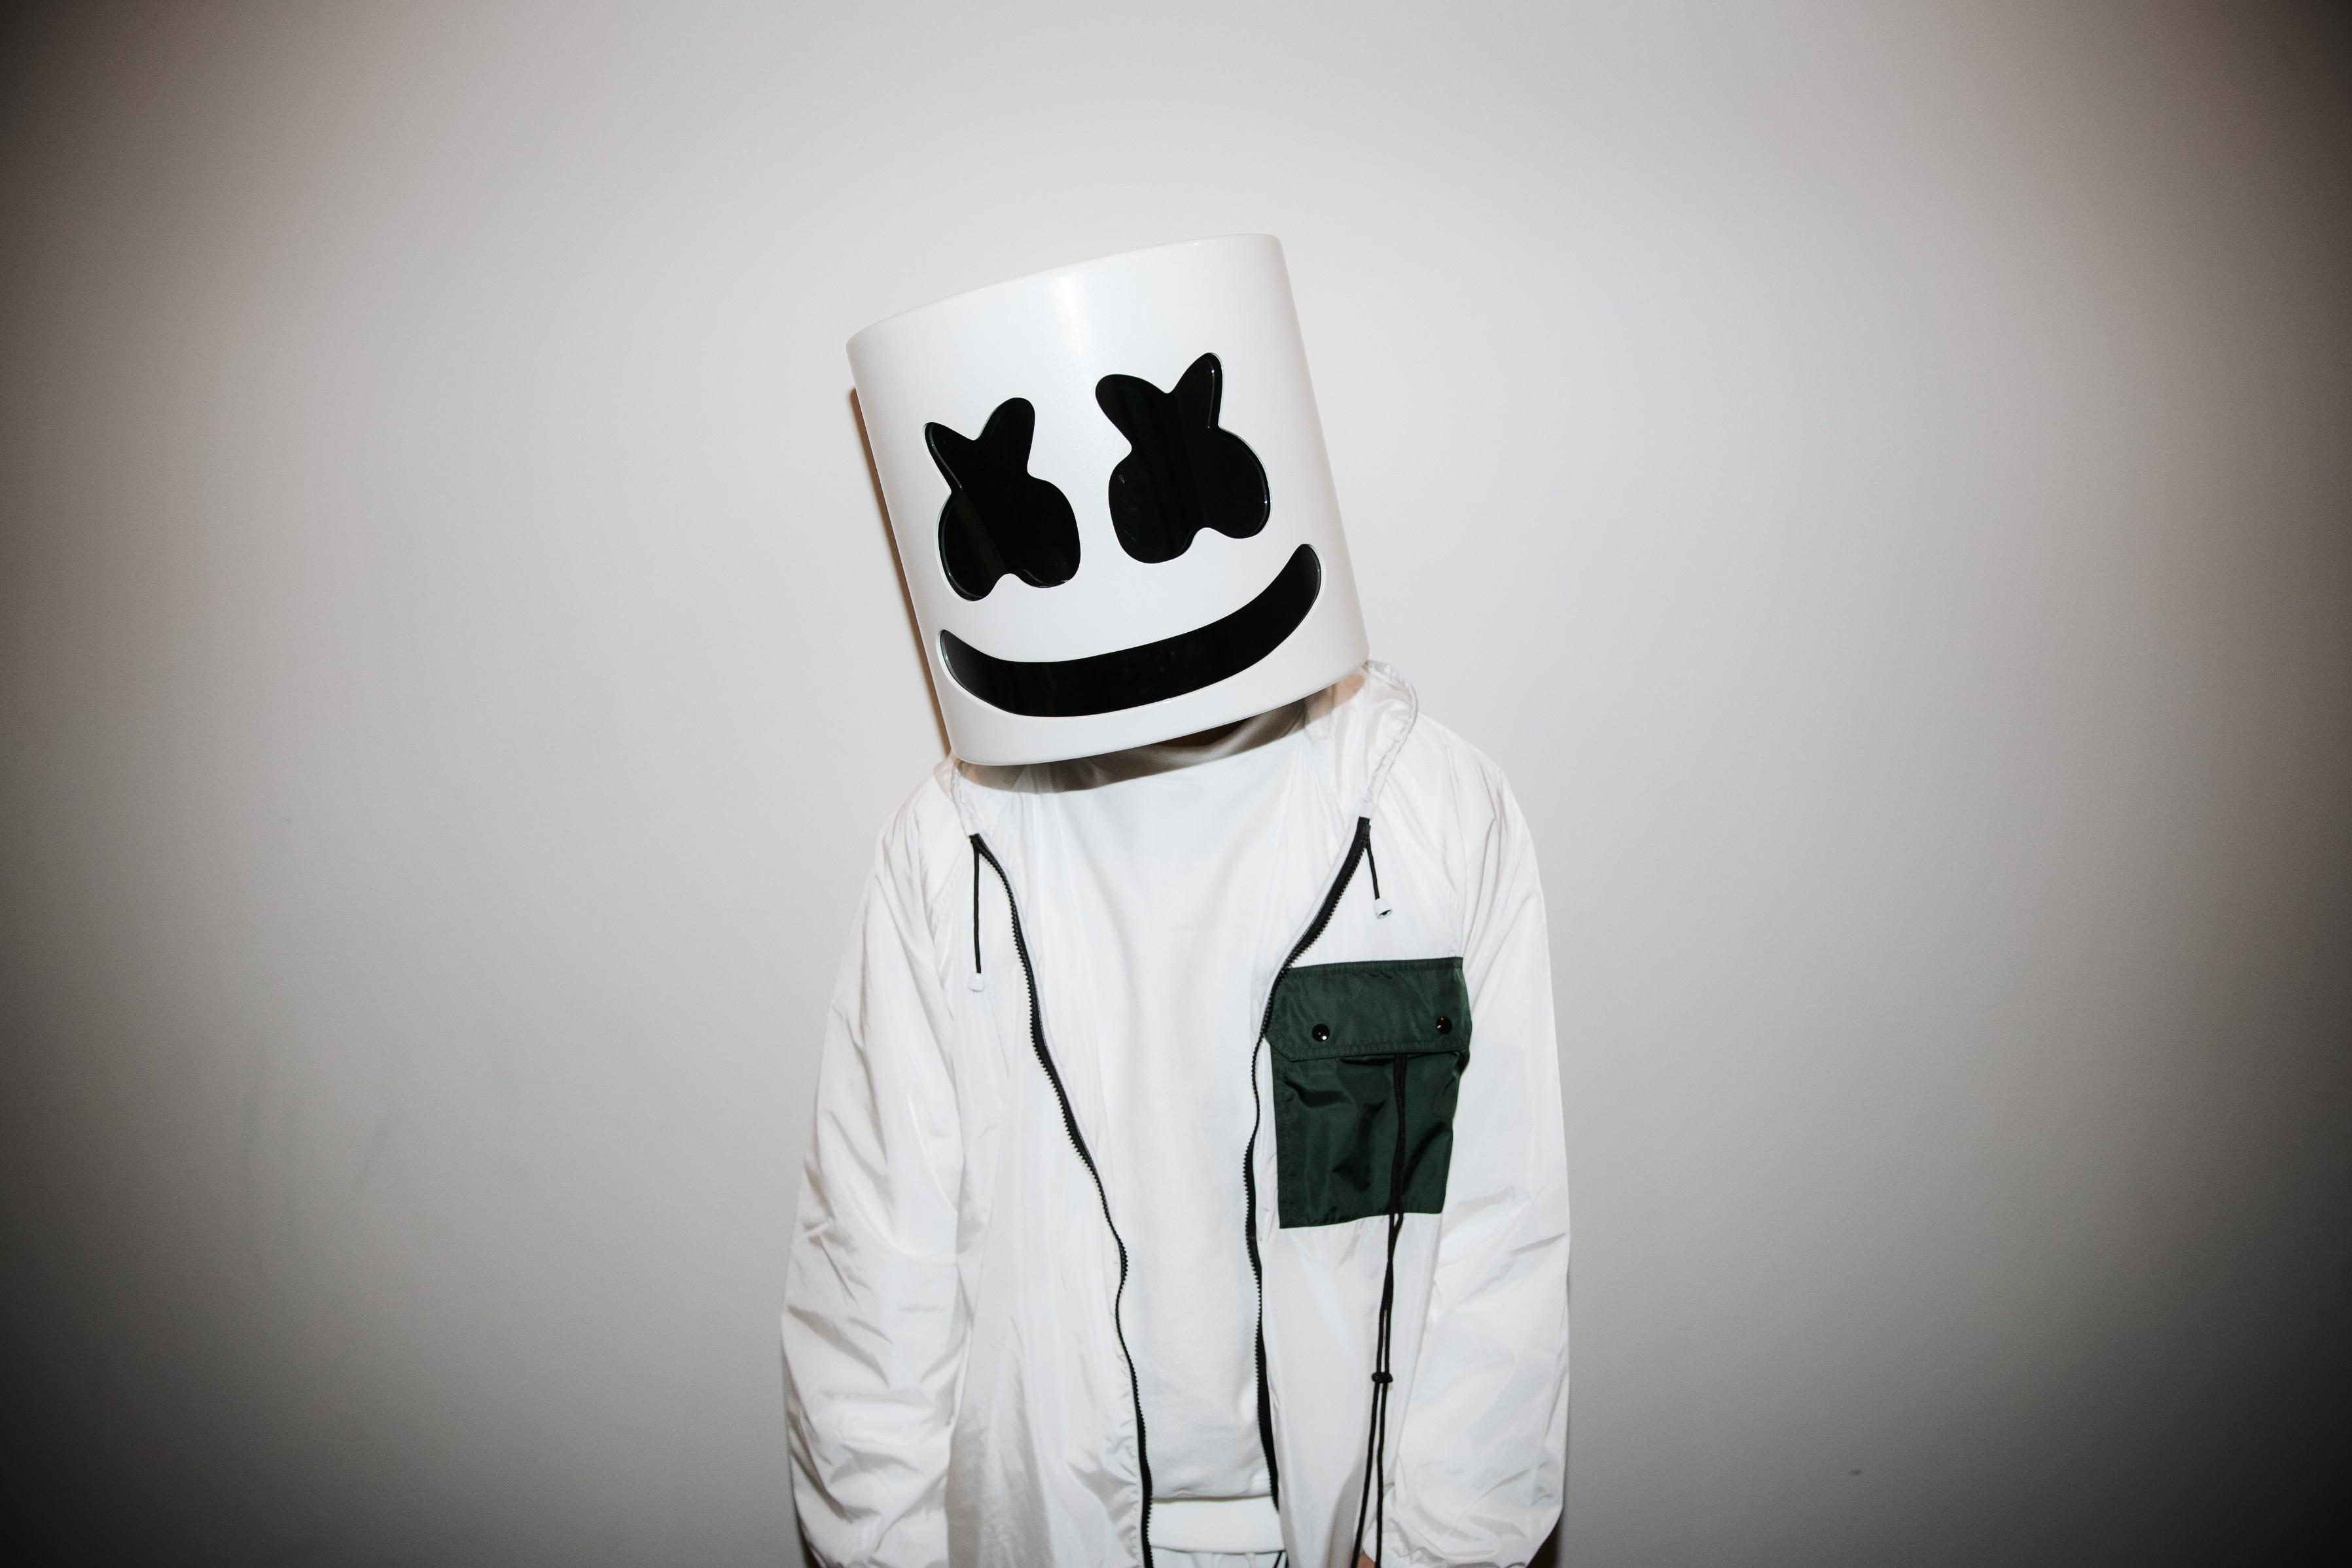 Marshmello开嗓,新专辑将拉手中国艺人连接音乐桥梁